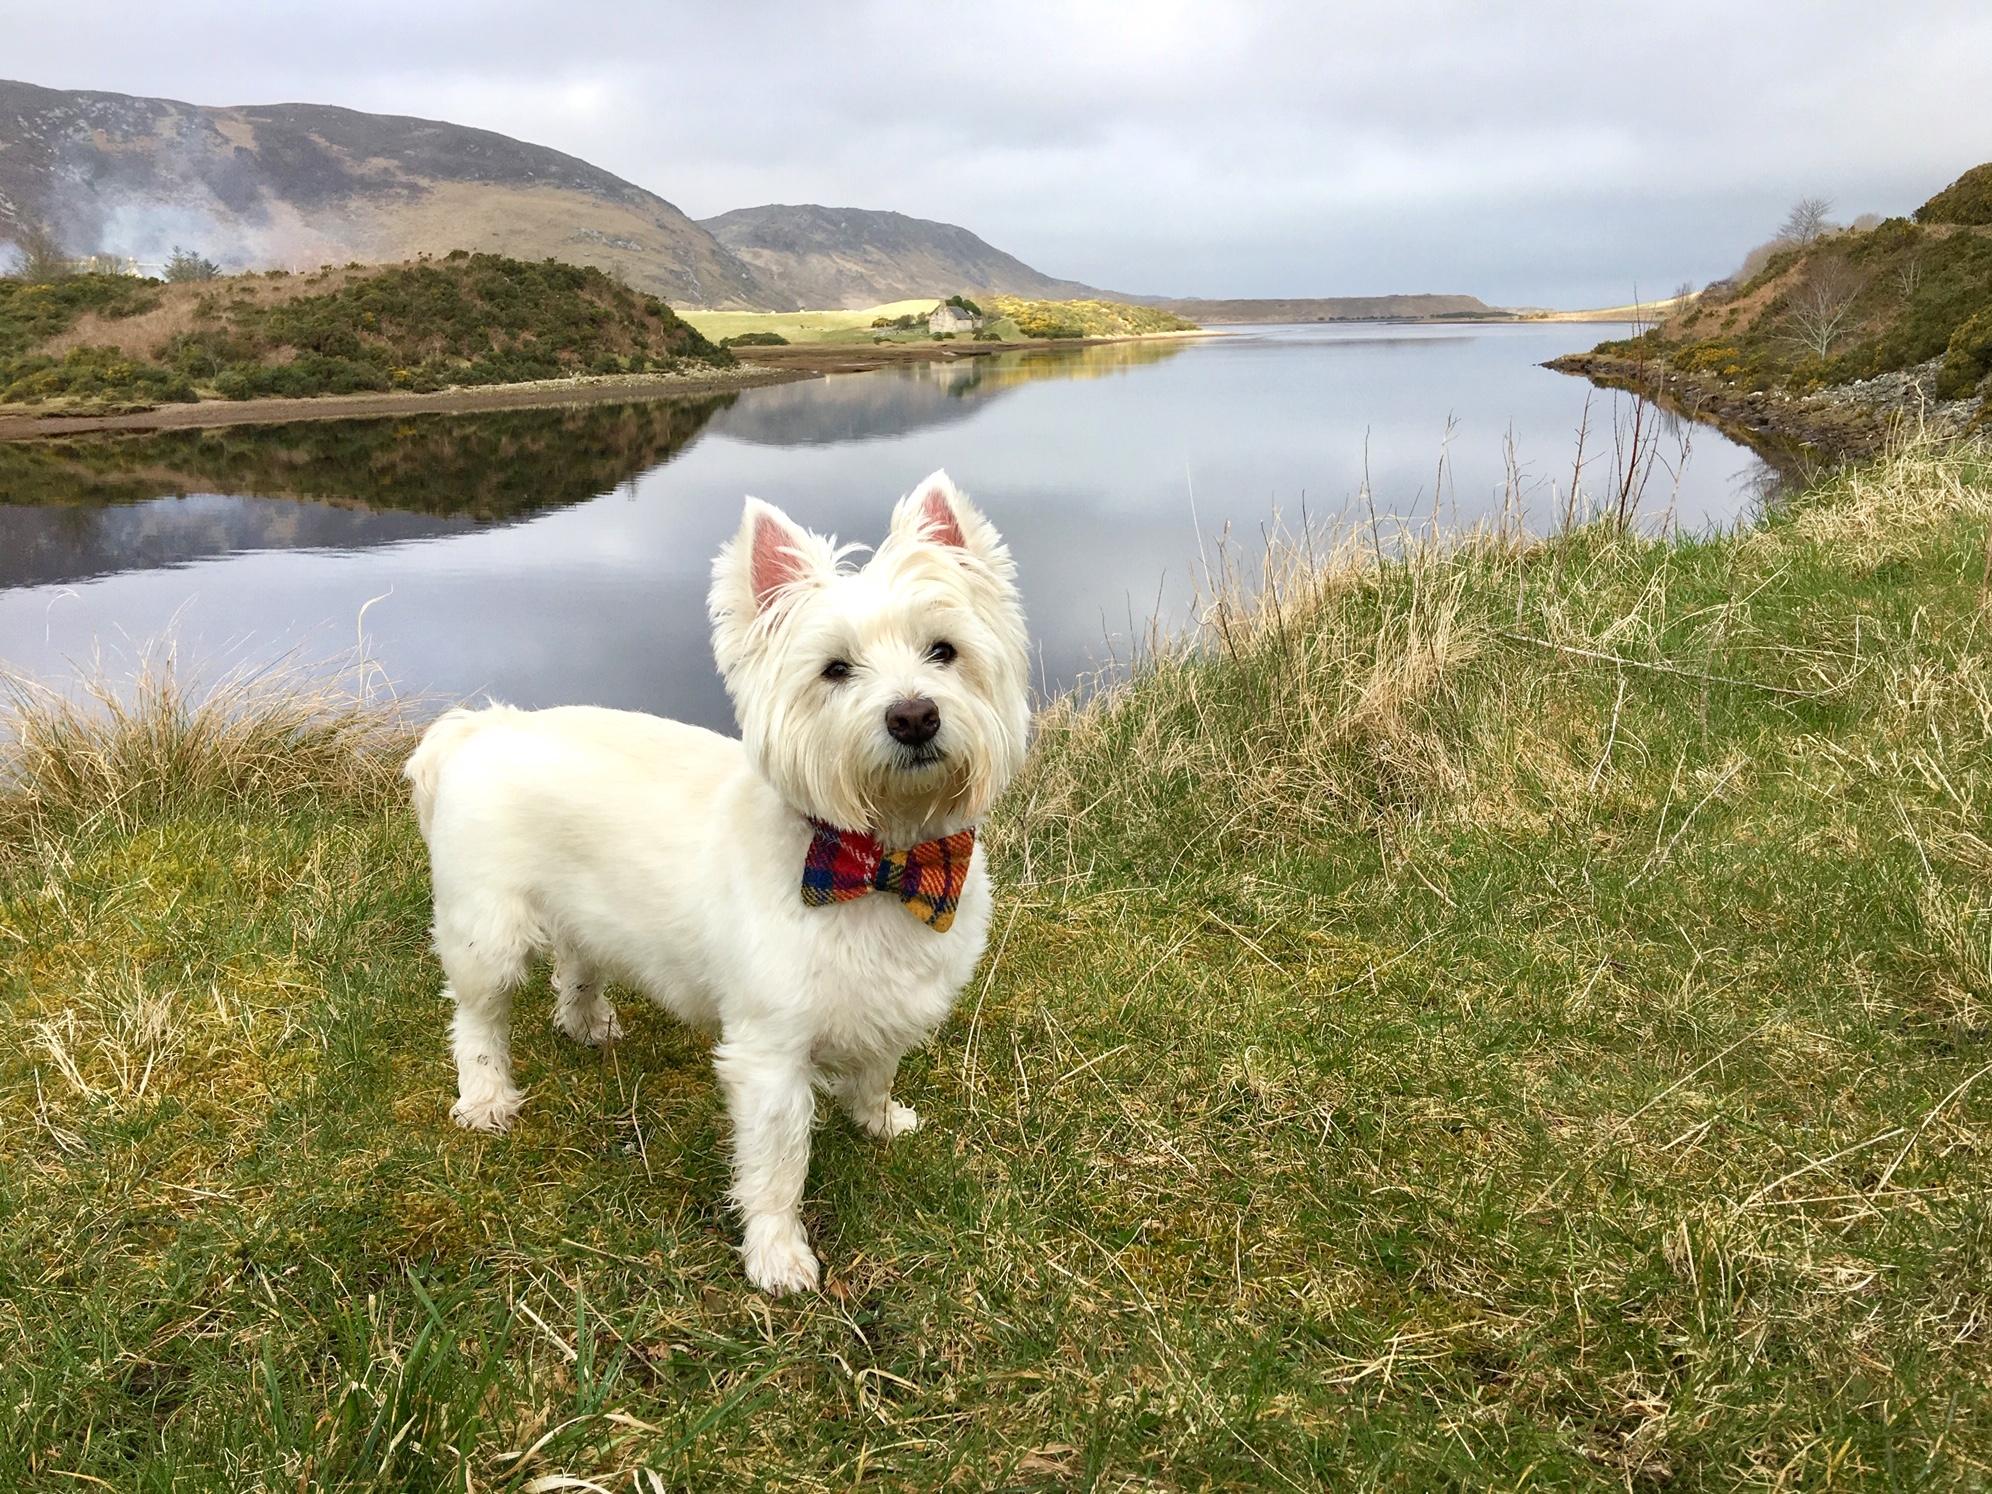 Dog Friendly Travels Along the NC500! - North Coast 500